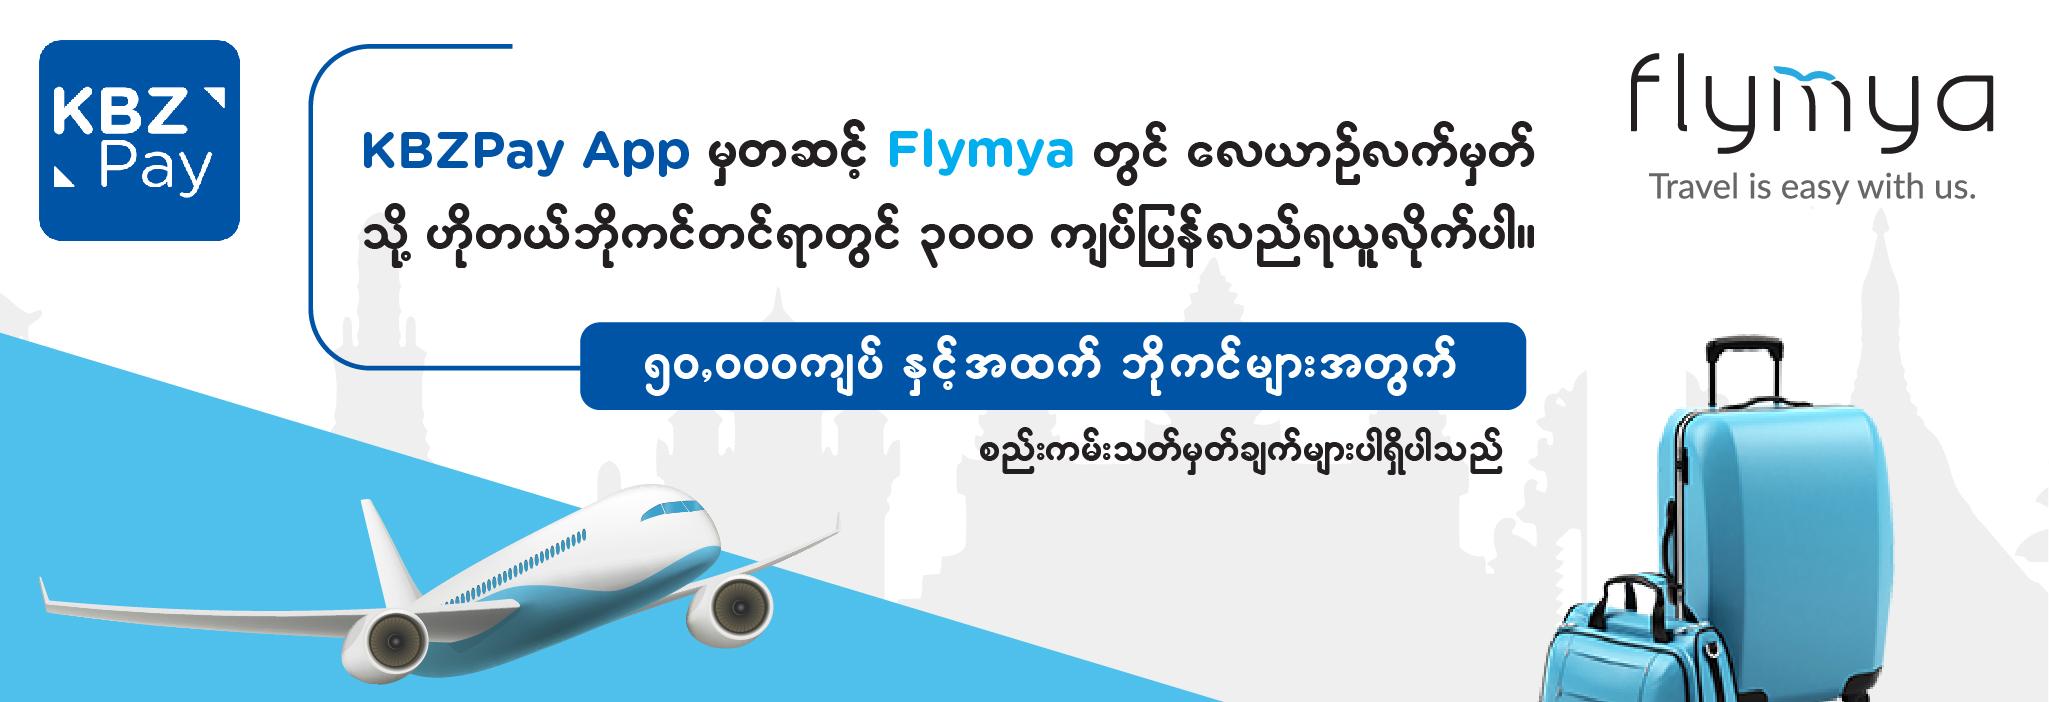 Get cash back 3,000 kyats for Flymya bookings